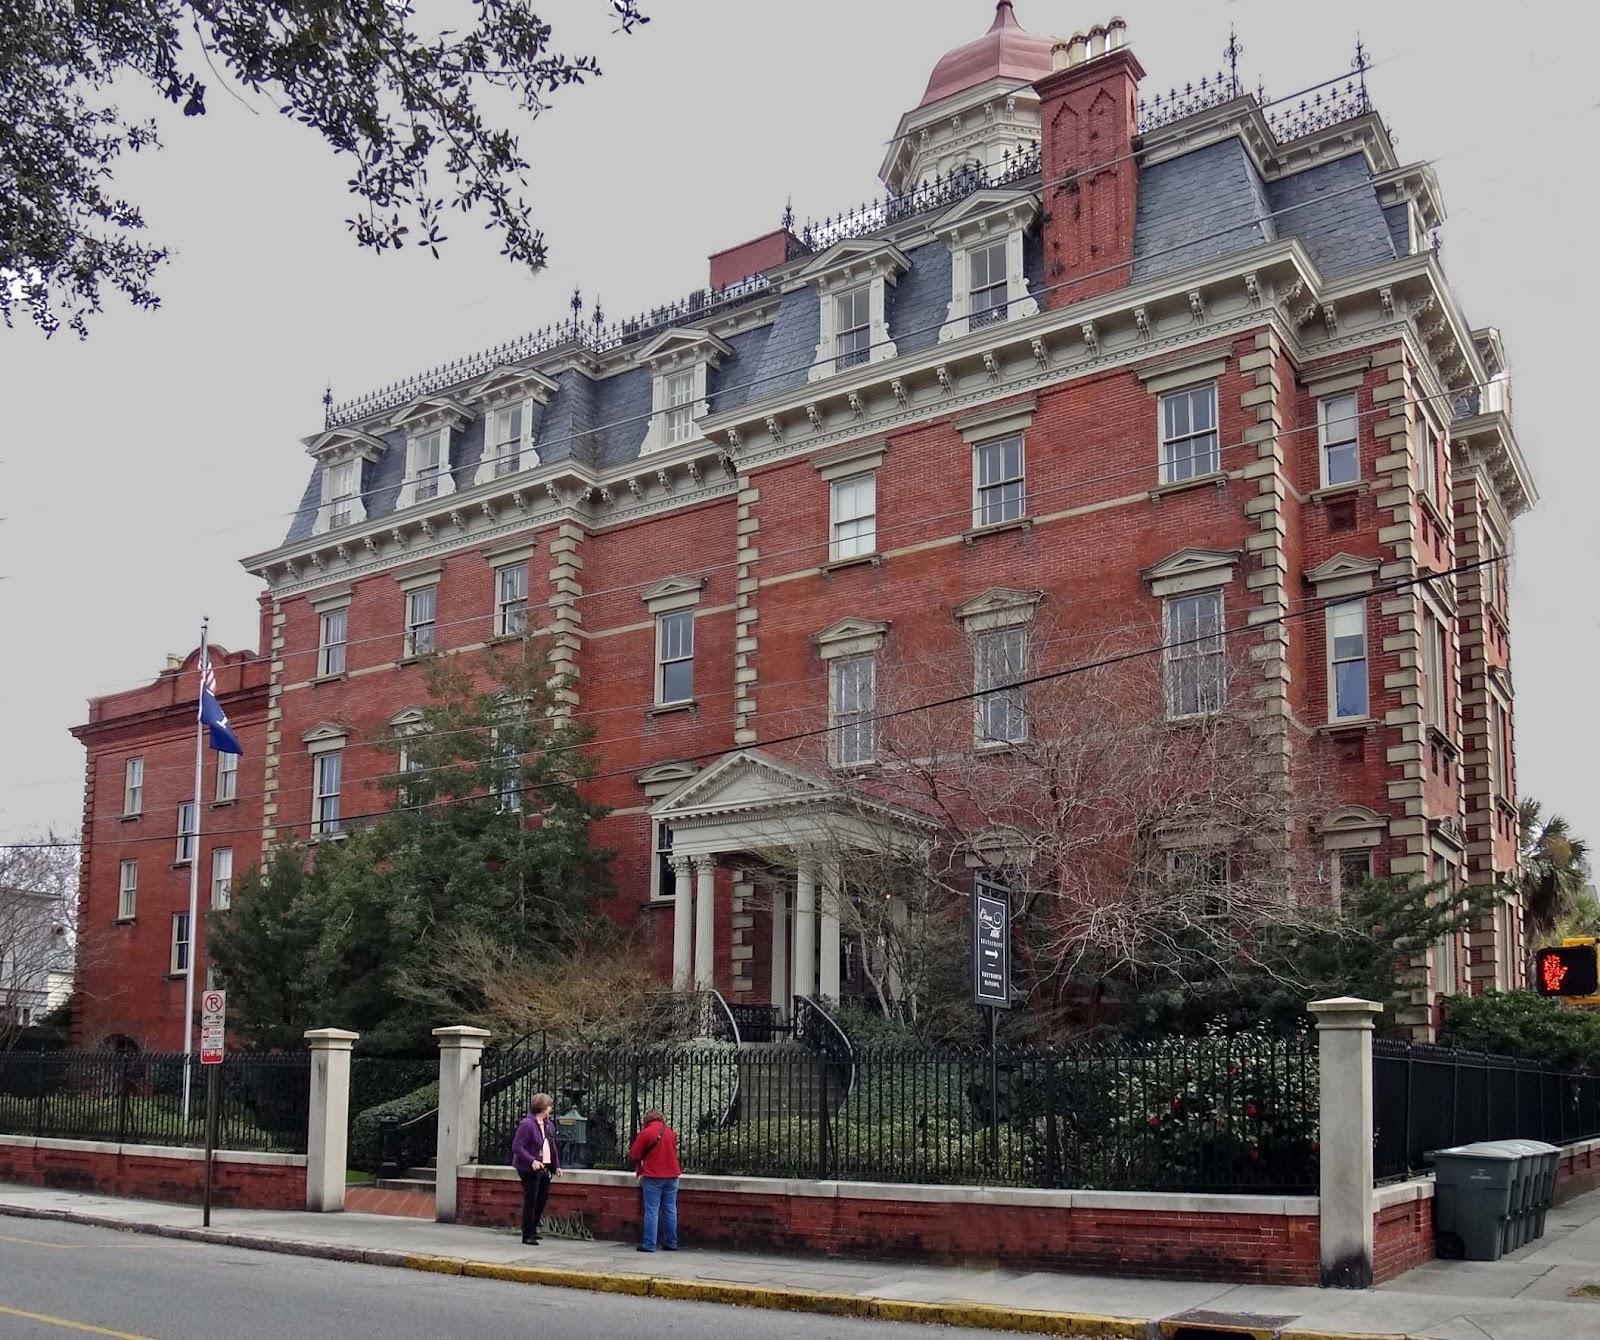 Joe U0026 39 S Retirement Blog  Wentworth Mansion  Charleston